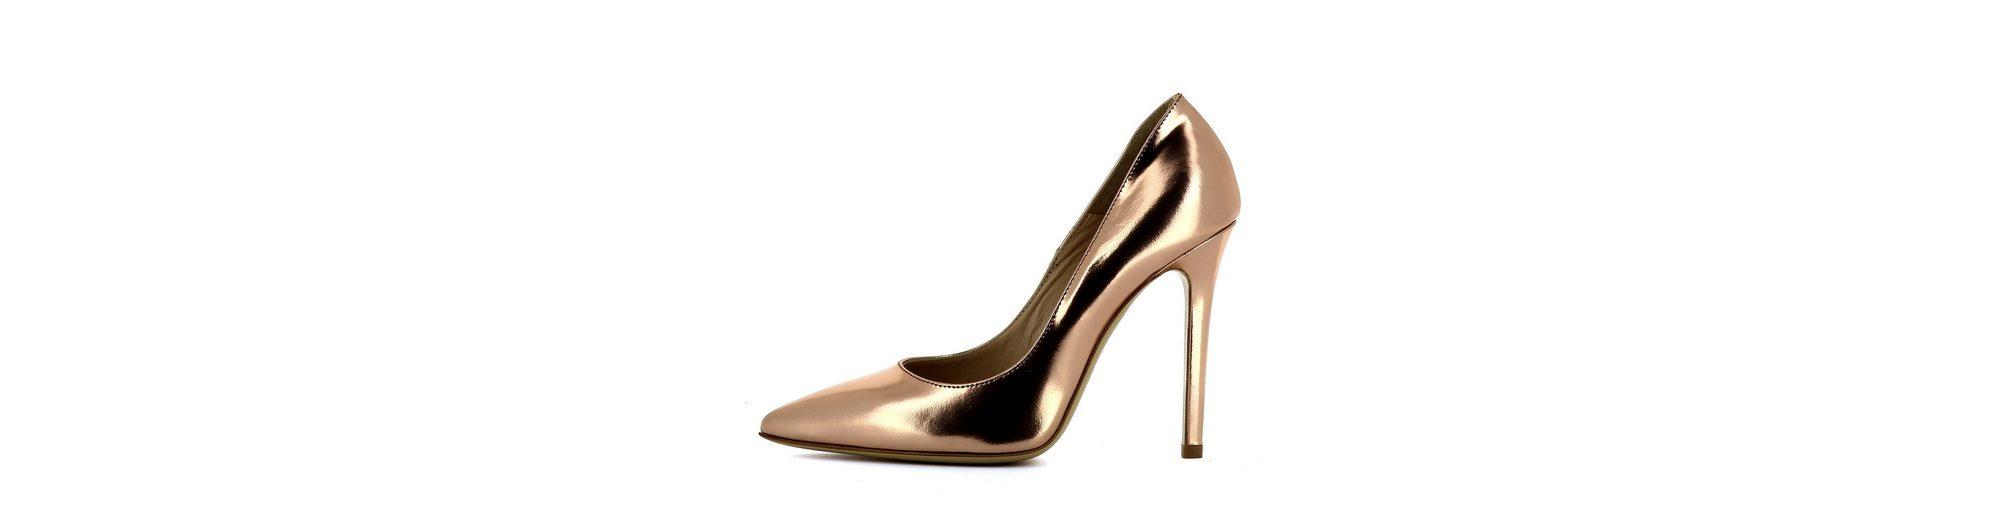 Evita MIA High-Heel-Pumps Original Zum Verkauf S4MvHKDwrA